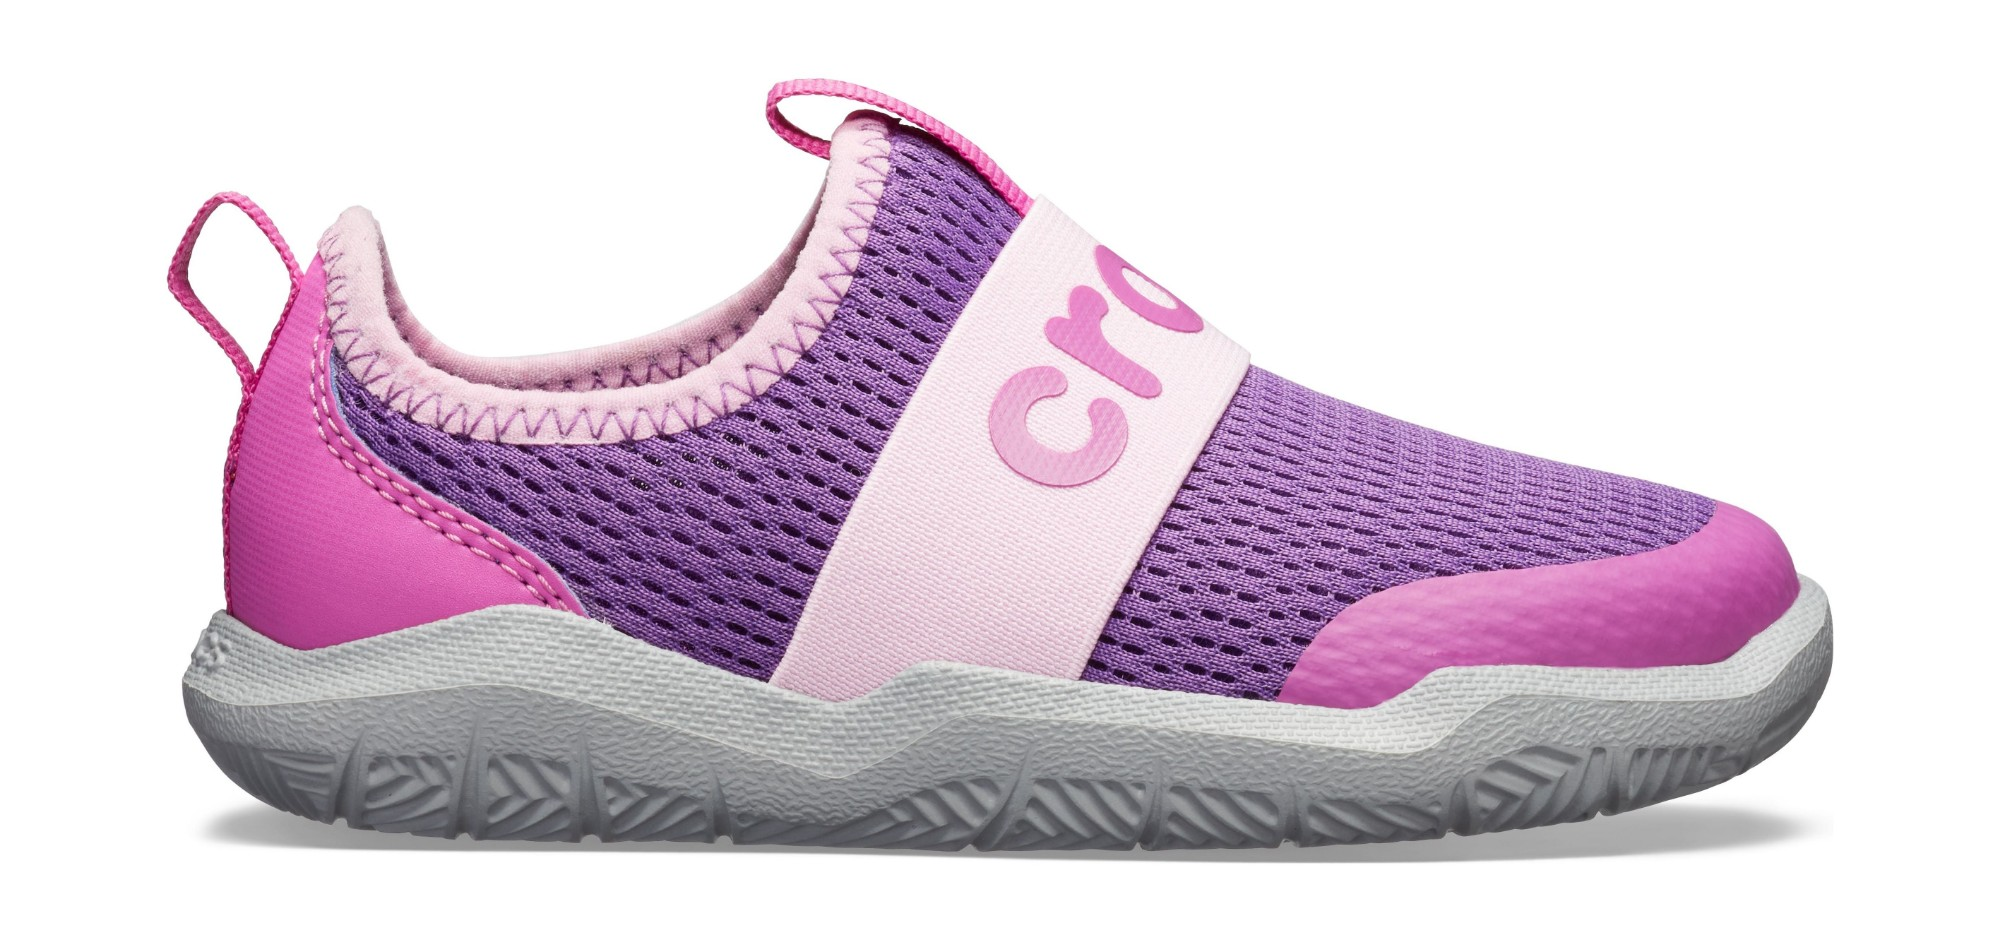 Crocs™ Swiftwater Easy-On Logo Shoe Kid's Amethyst/Vibrant Violet 33,5